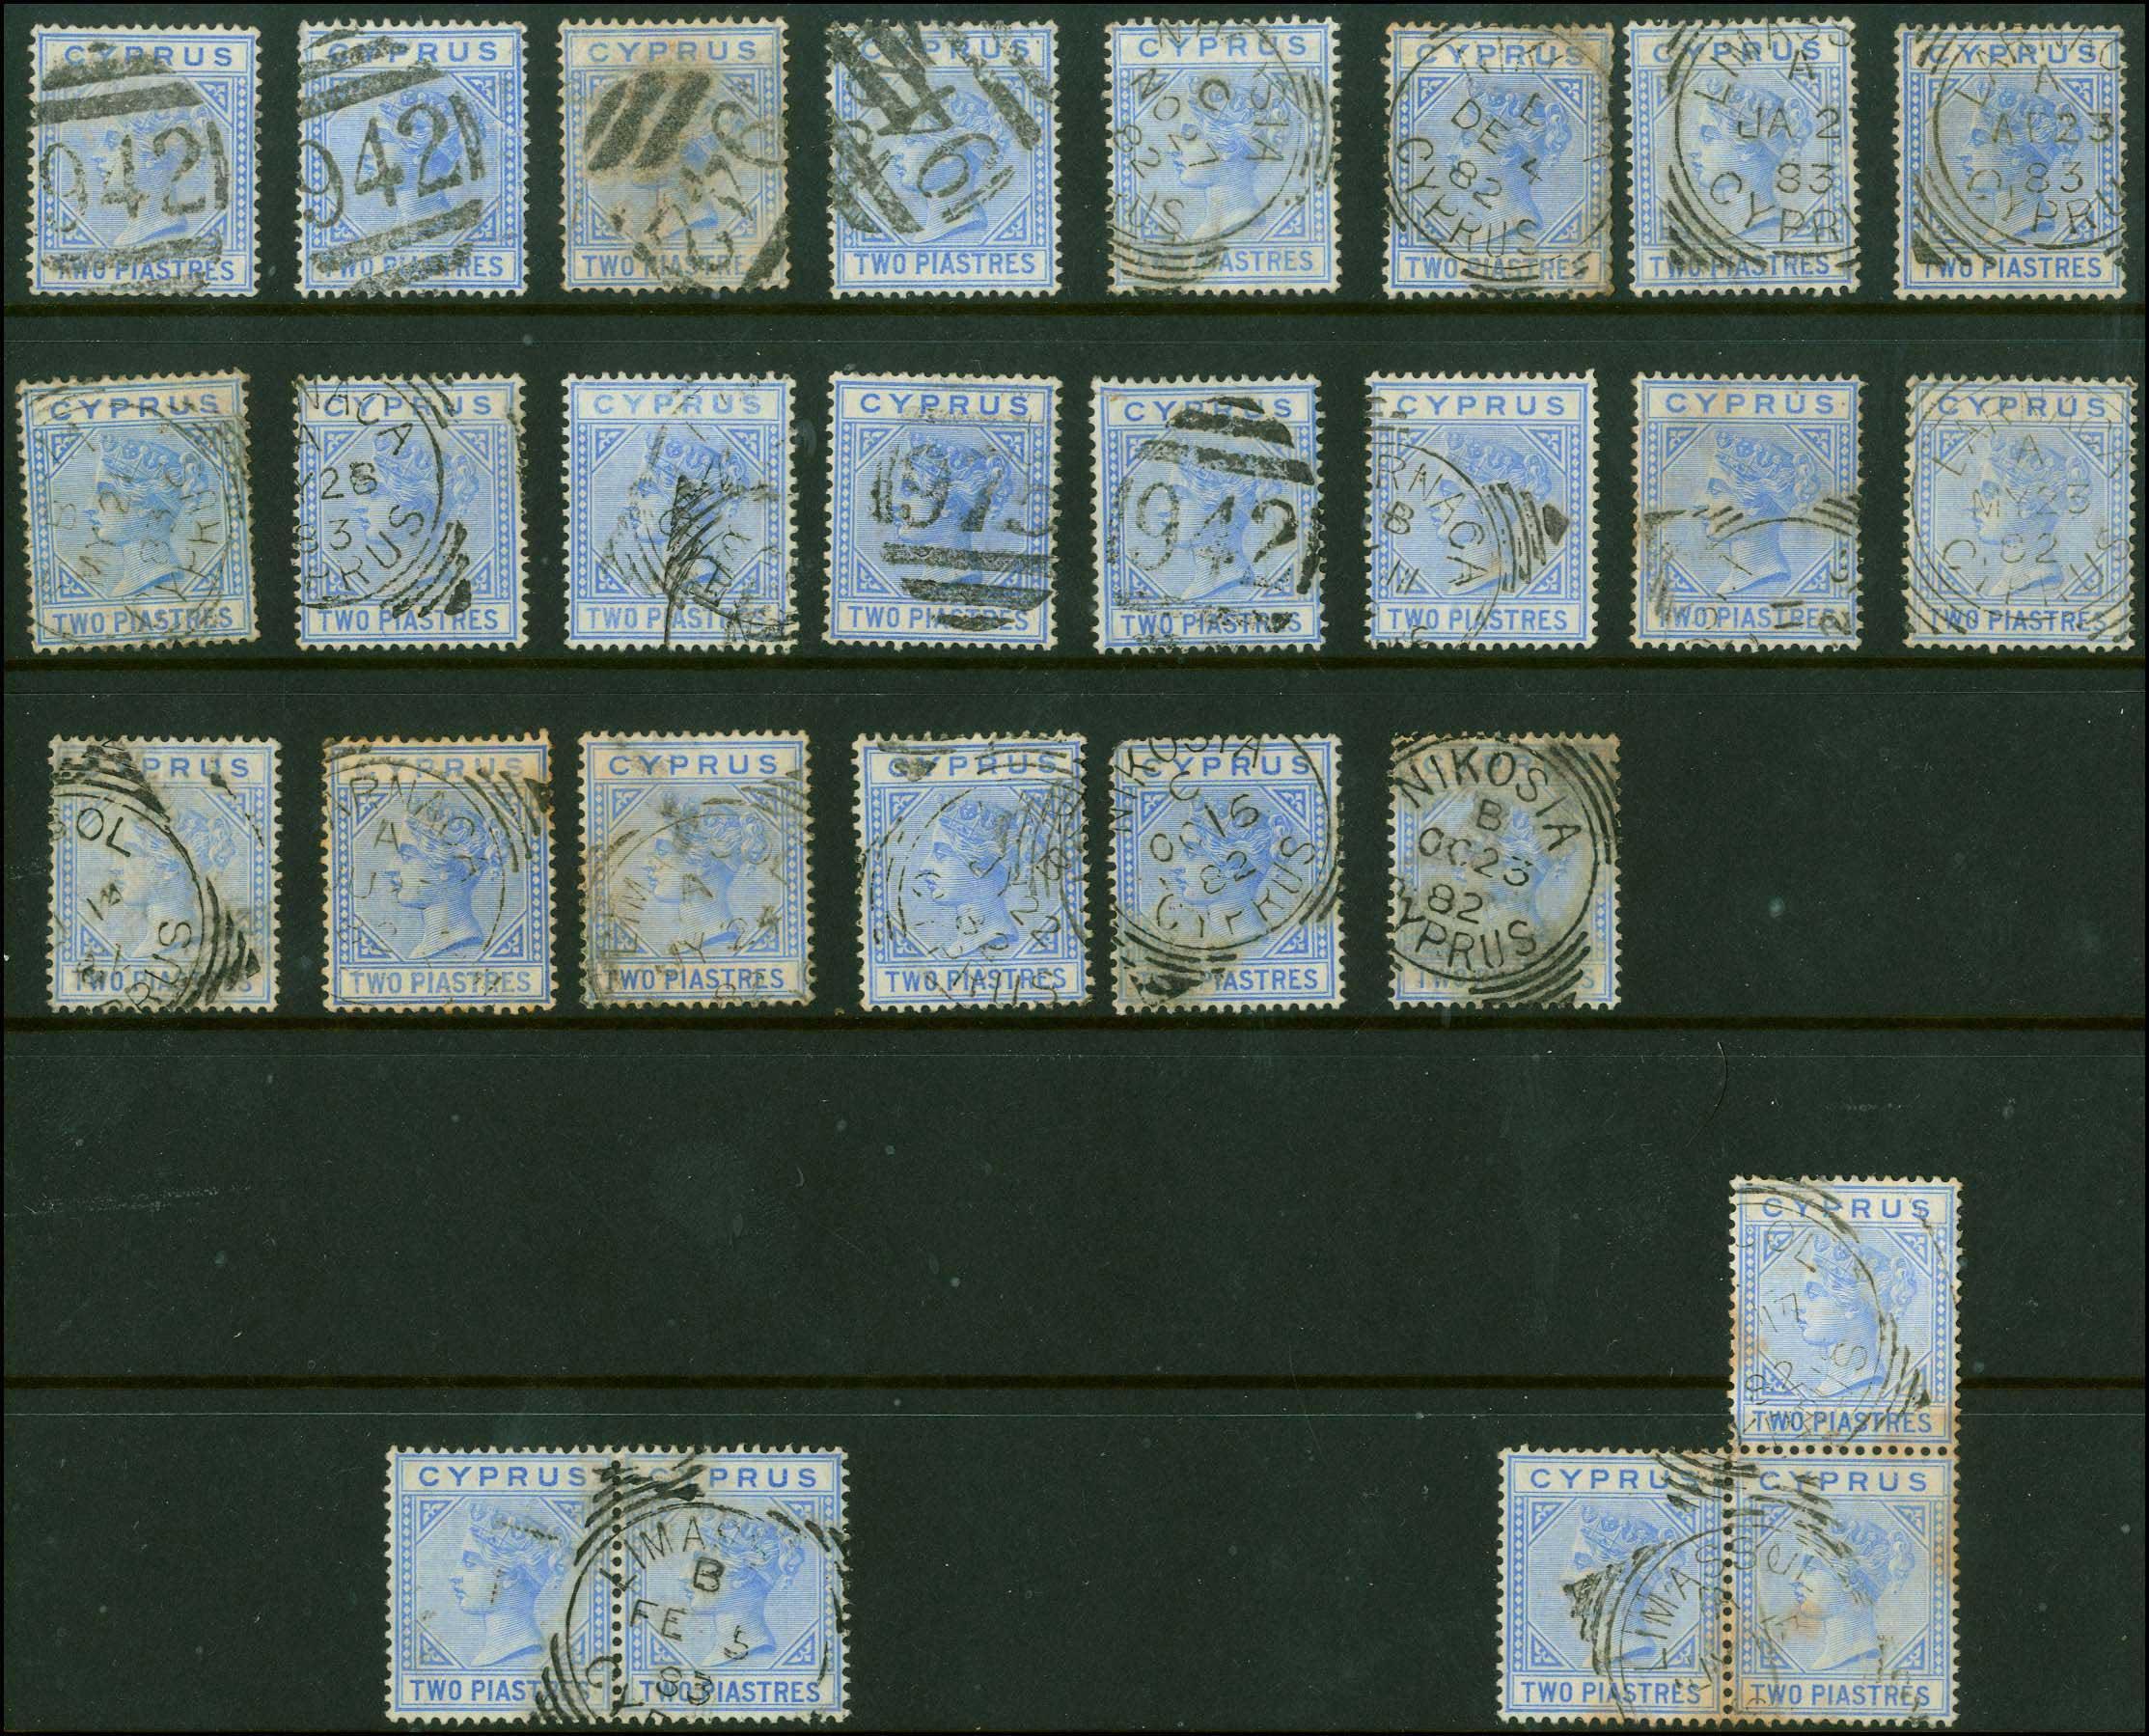 Lot 1341 - -  CYPRUS Cyprus -  A. Karamitsos Public Auction 637 General Stamp Sale